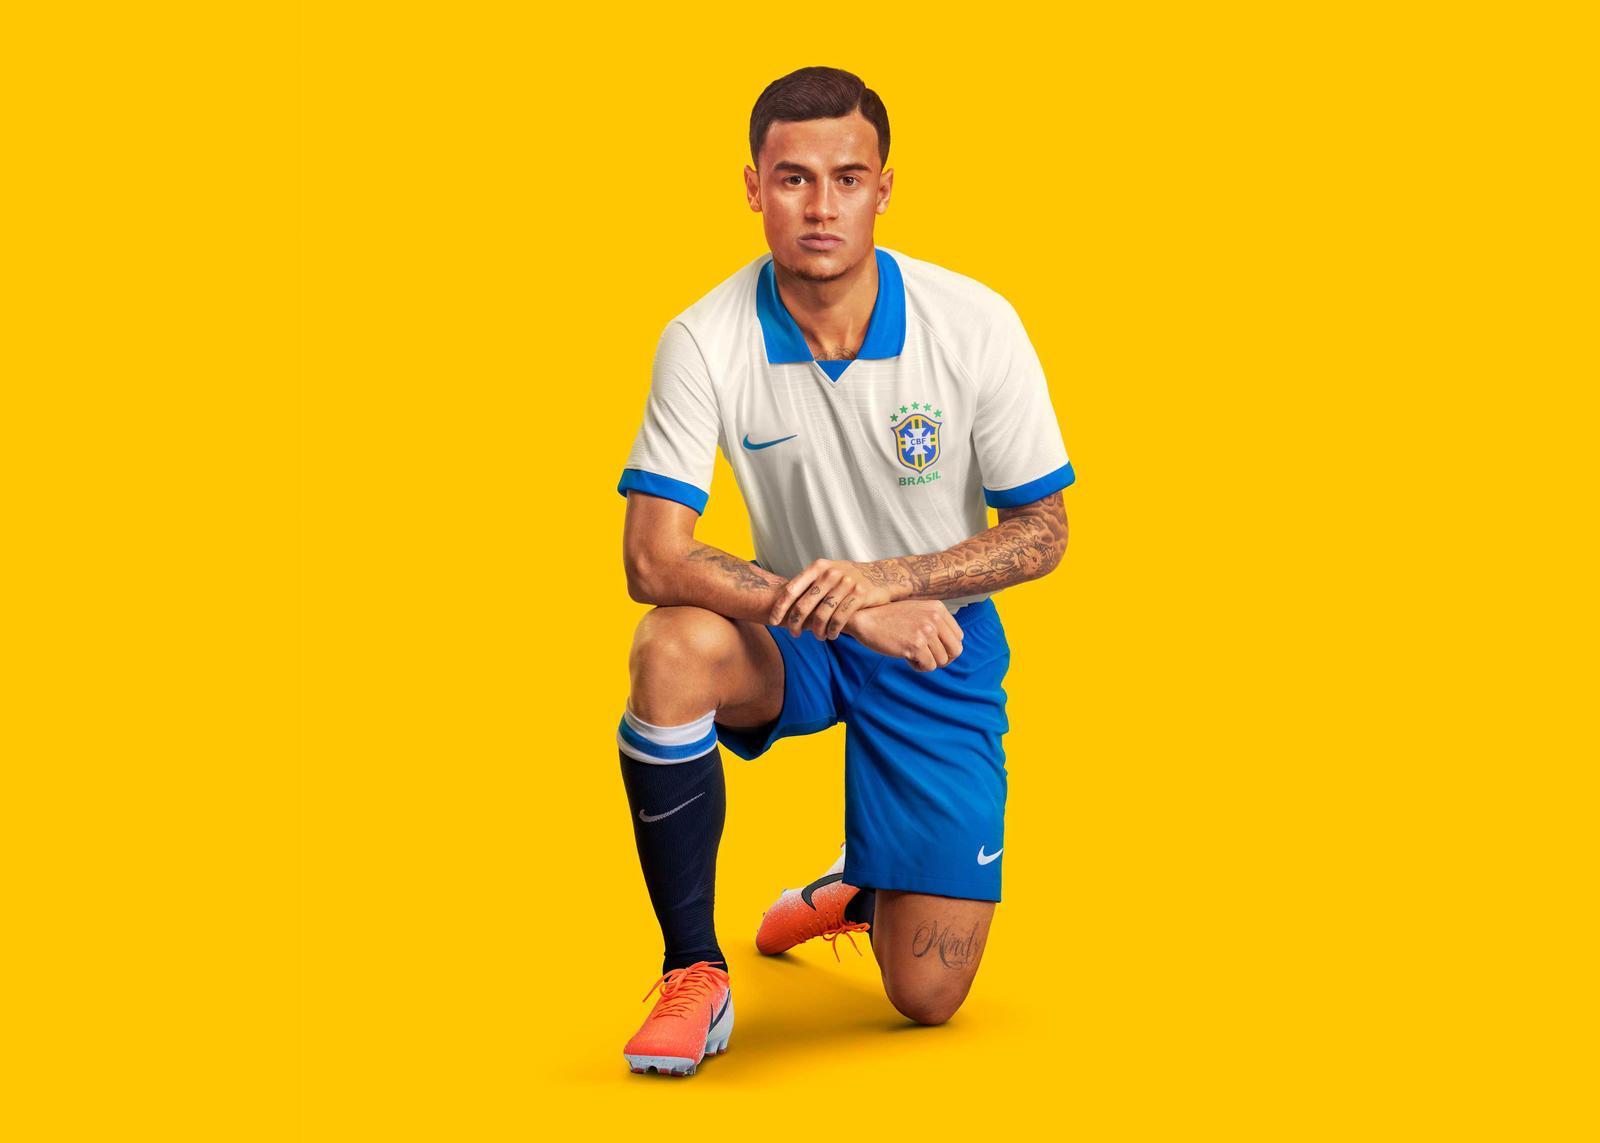 Nike 2019-20 Brasil Copa America 100th Anniversary Jersey Seleção Brasileira Collection 2